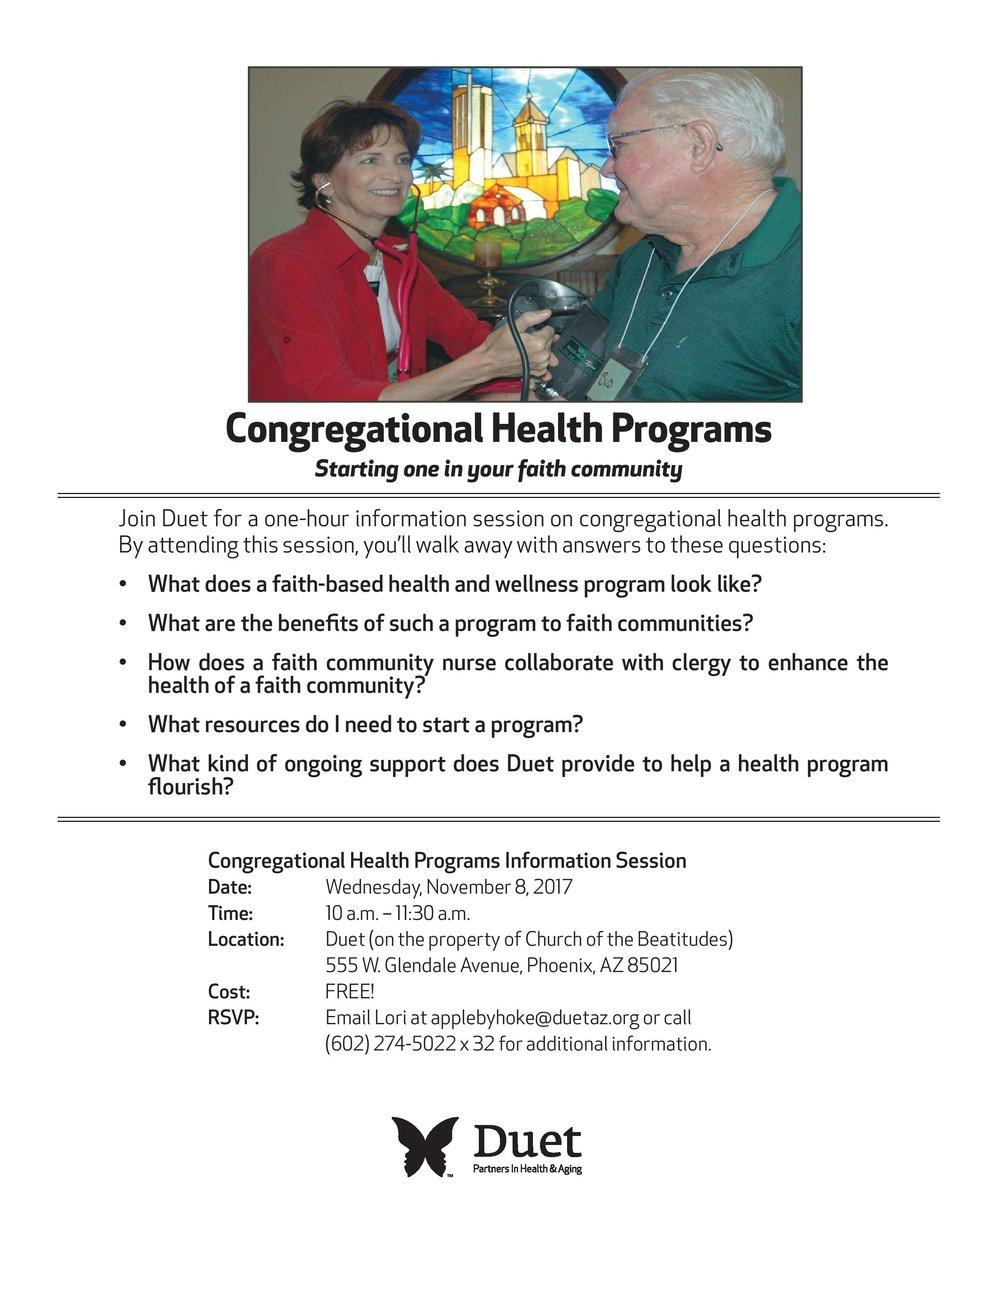 Duet Congregational Health Programs 2017.jpg